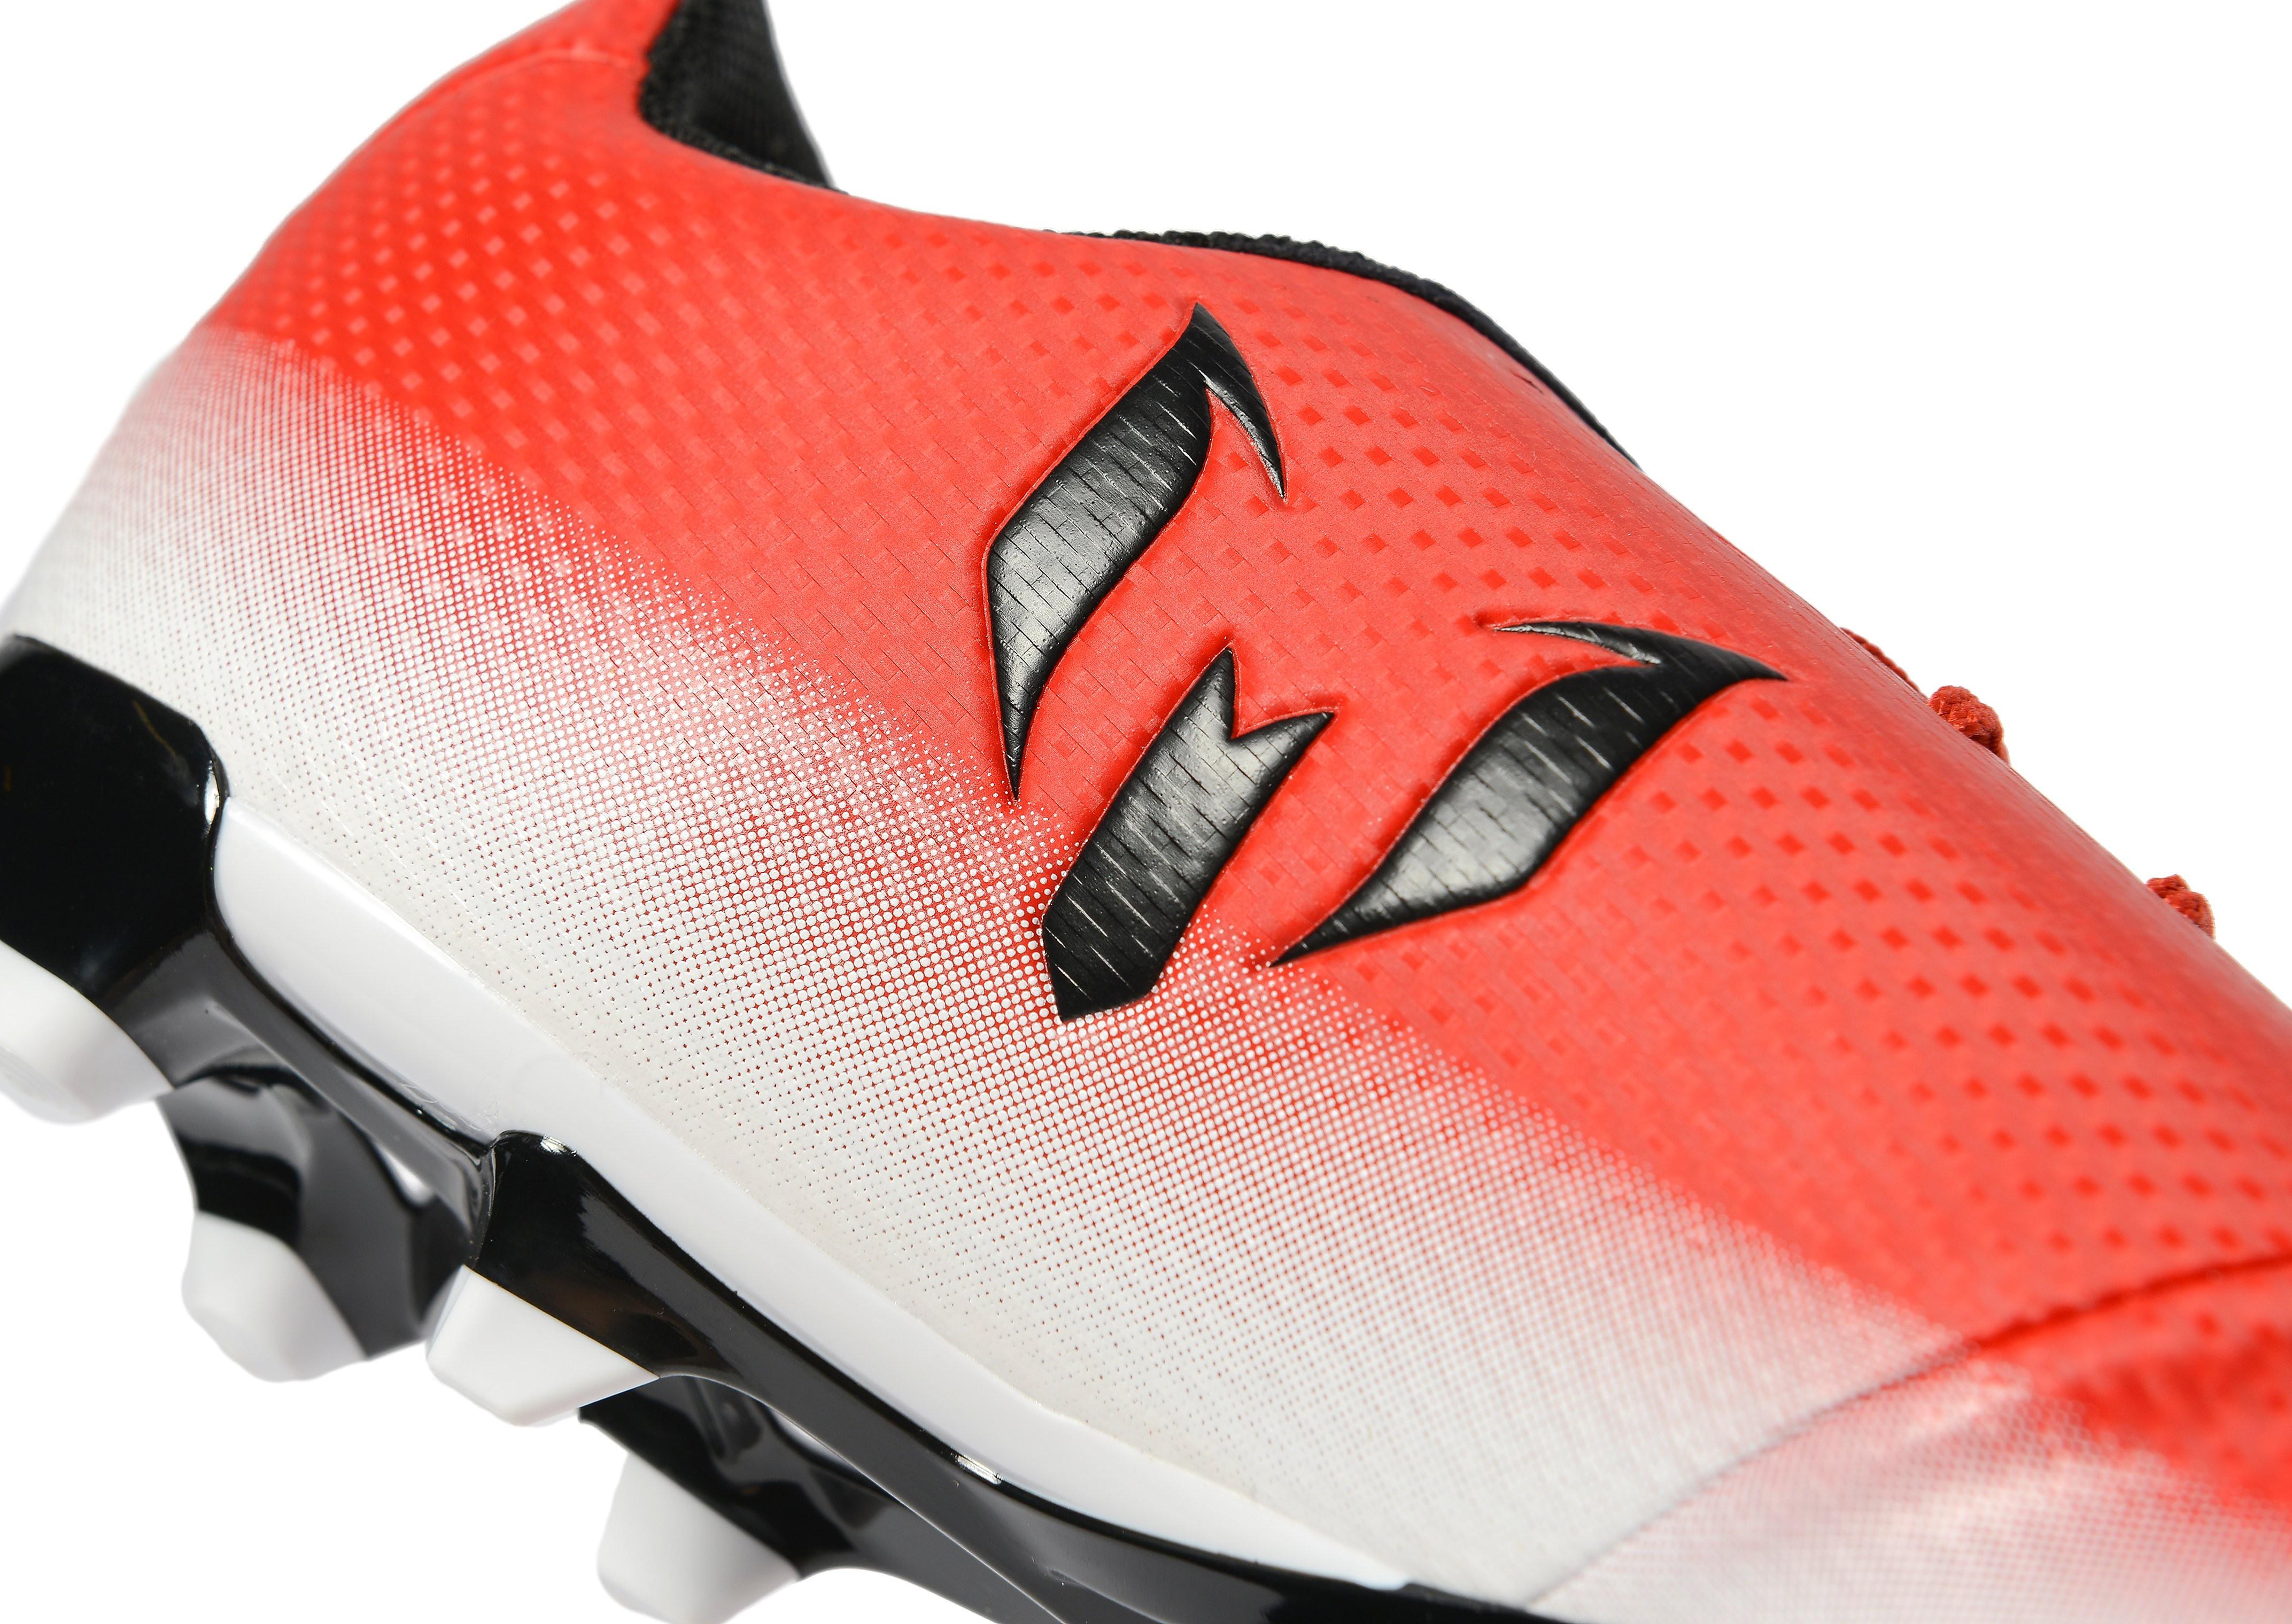 adidas Red Limit Messi 16.3 FG Junior